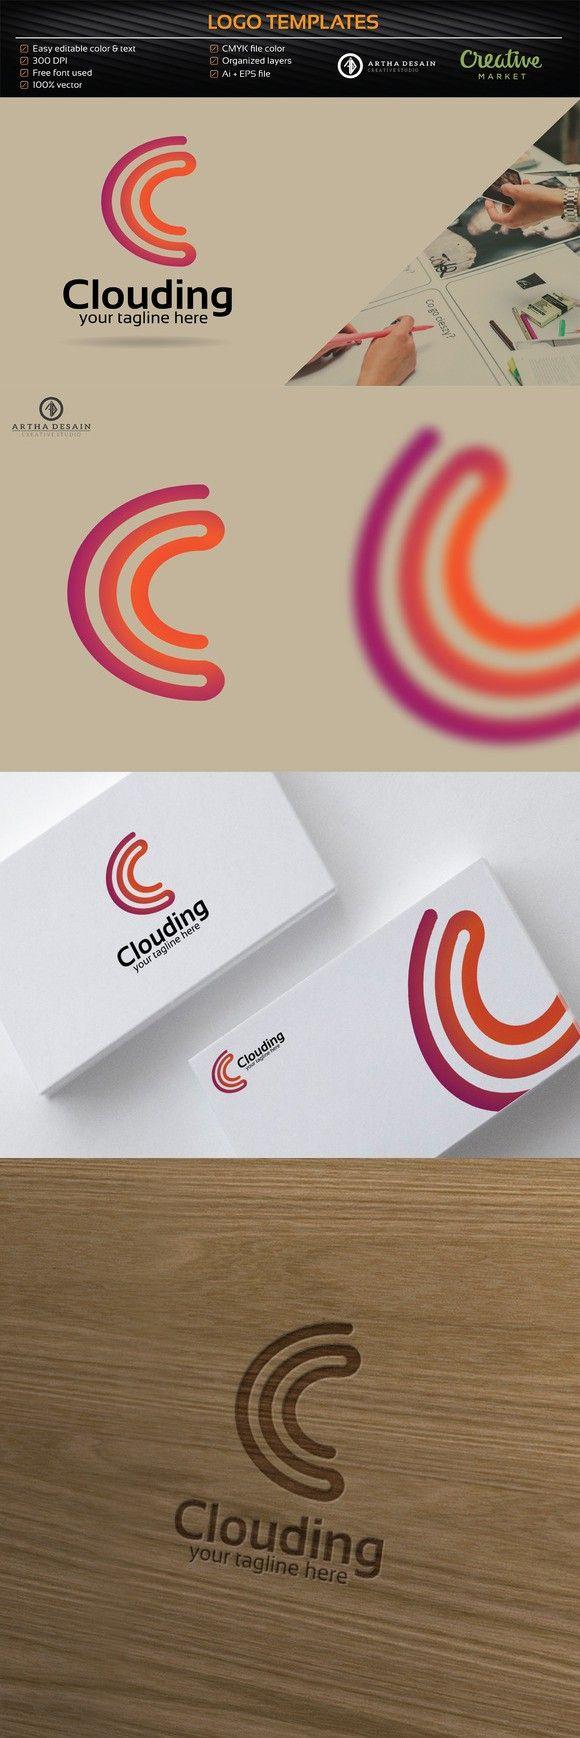 Clouding Letter C Logo - Logo Templa